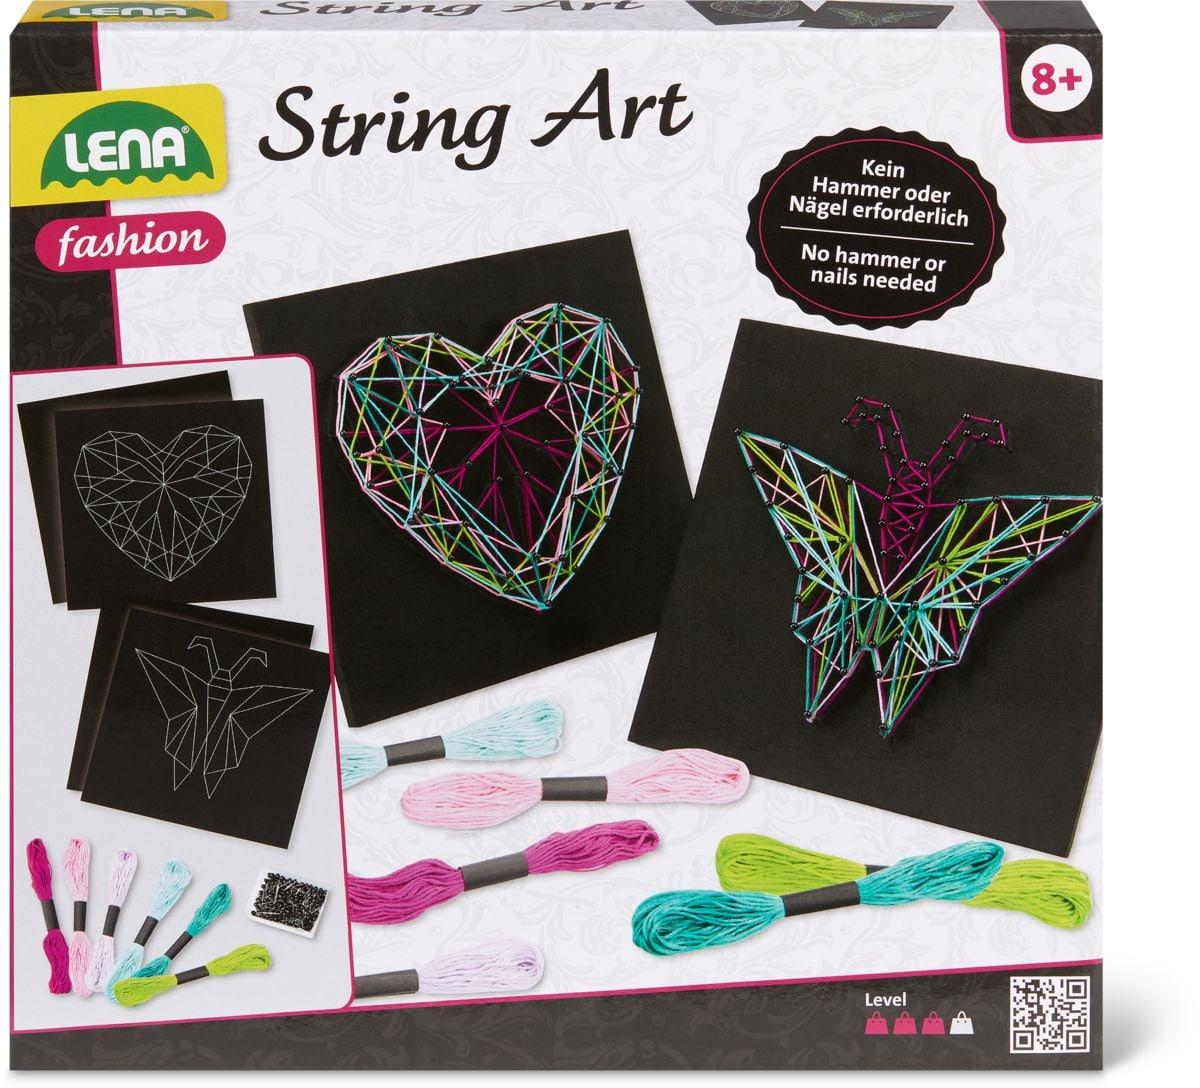 Lena String Art Schmetterling & Herz